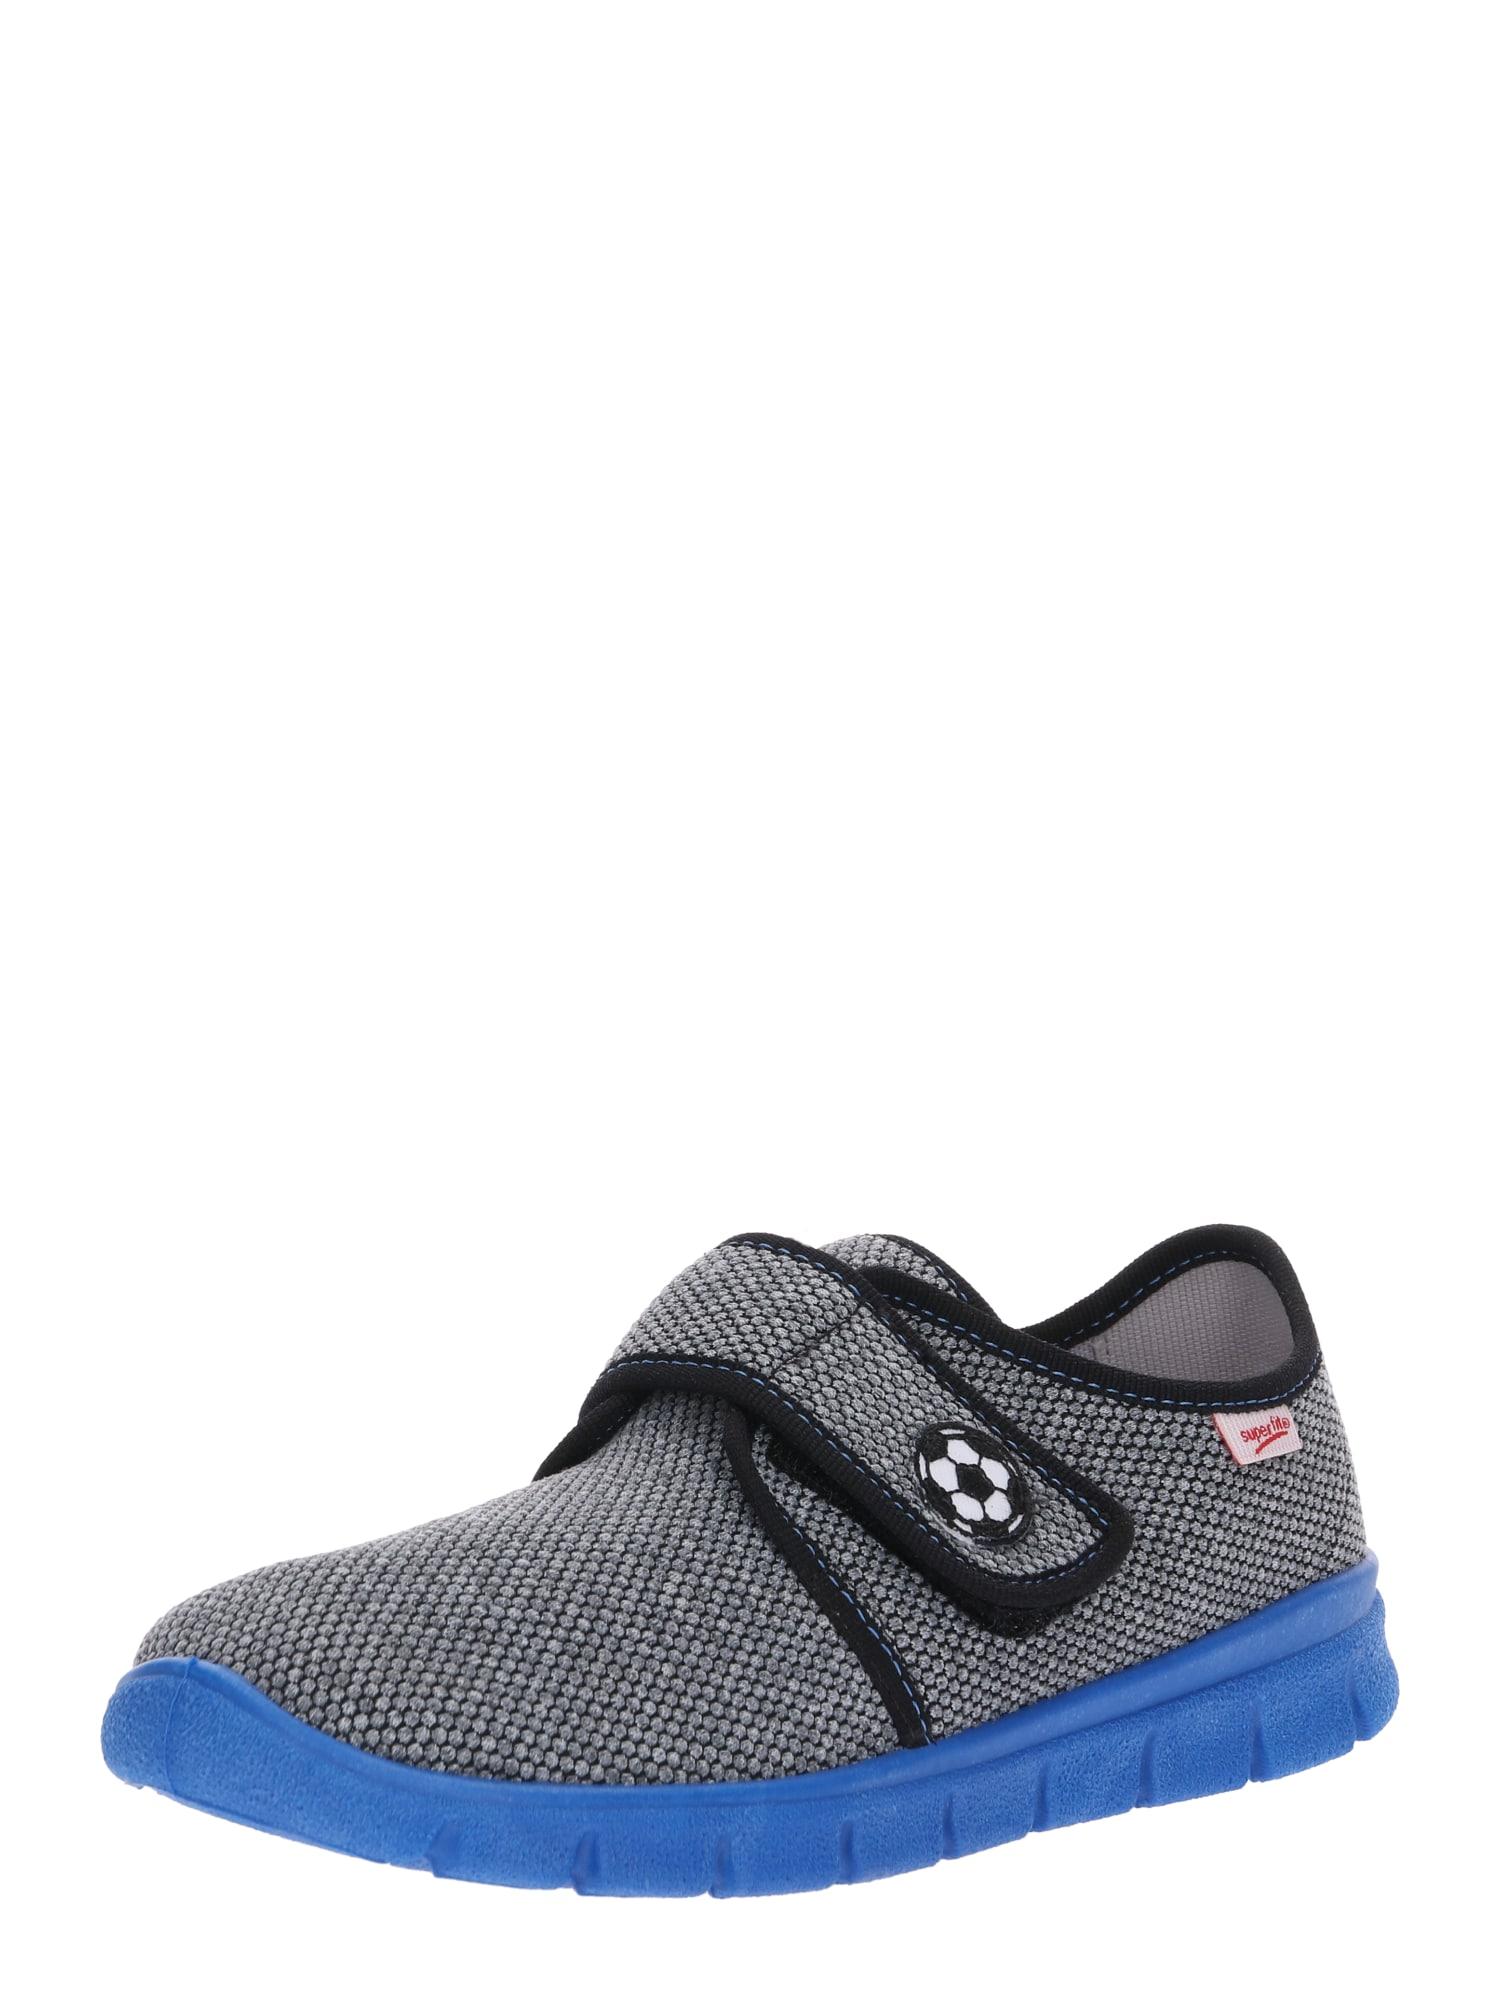 Pantofle Bobby modrá šedá SUPERFIT